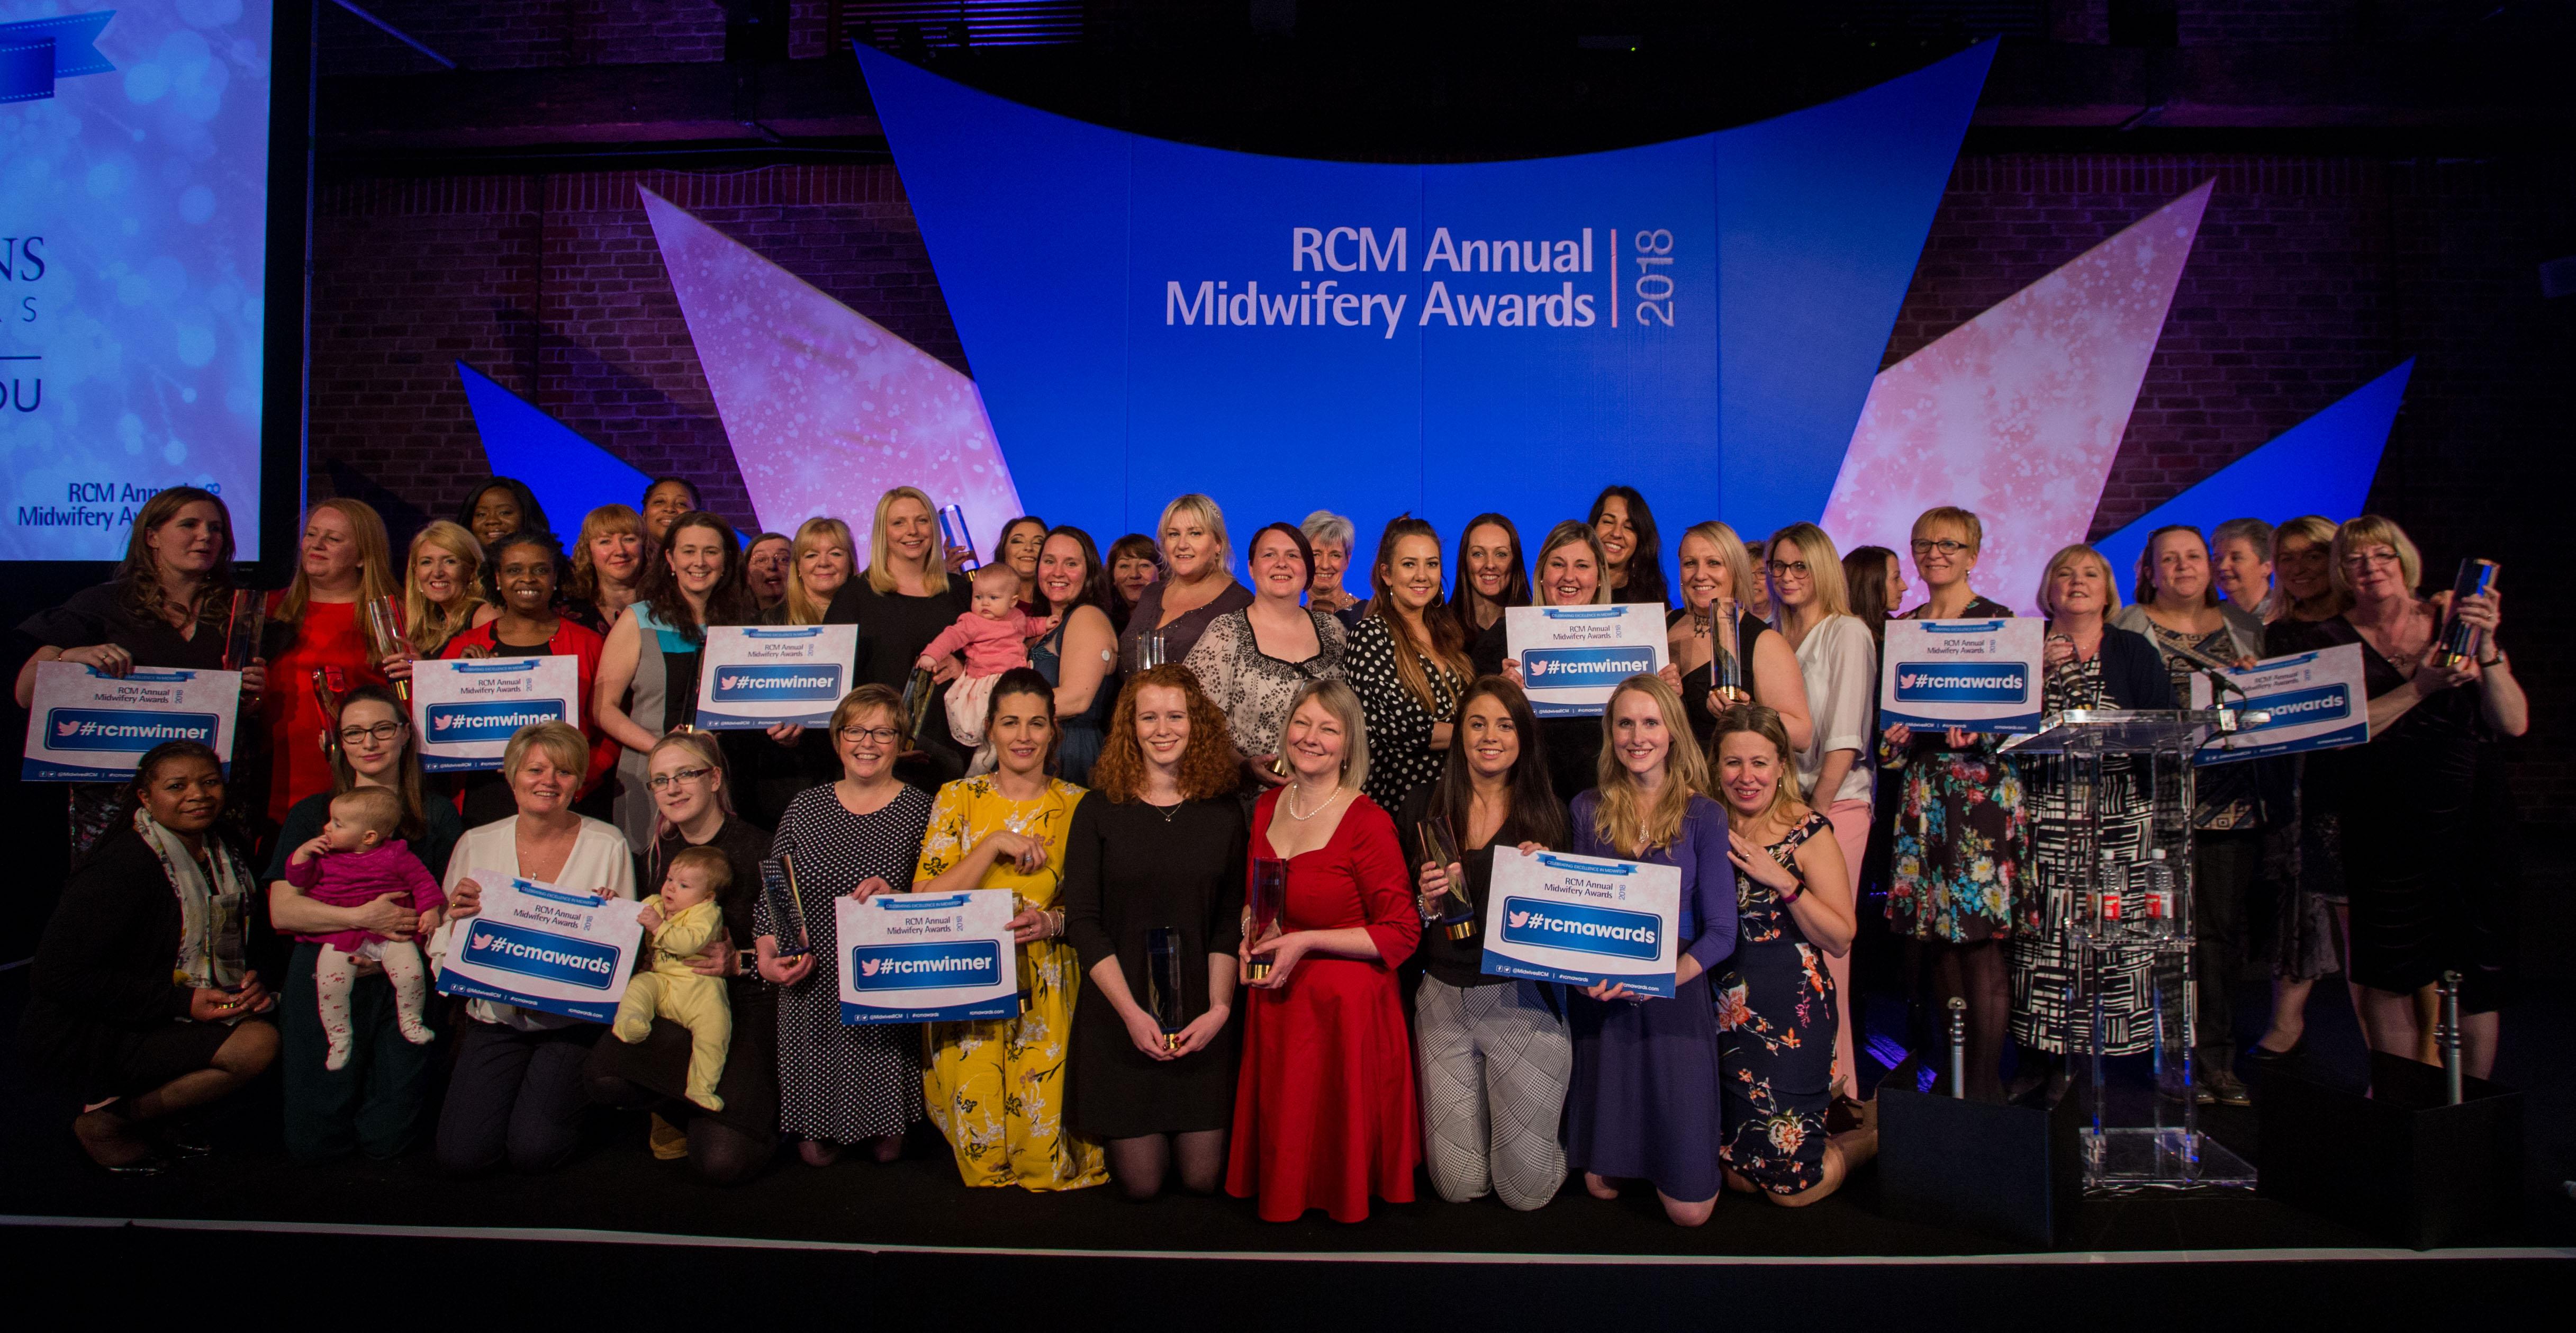 RCM AWARDS 2018